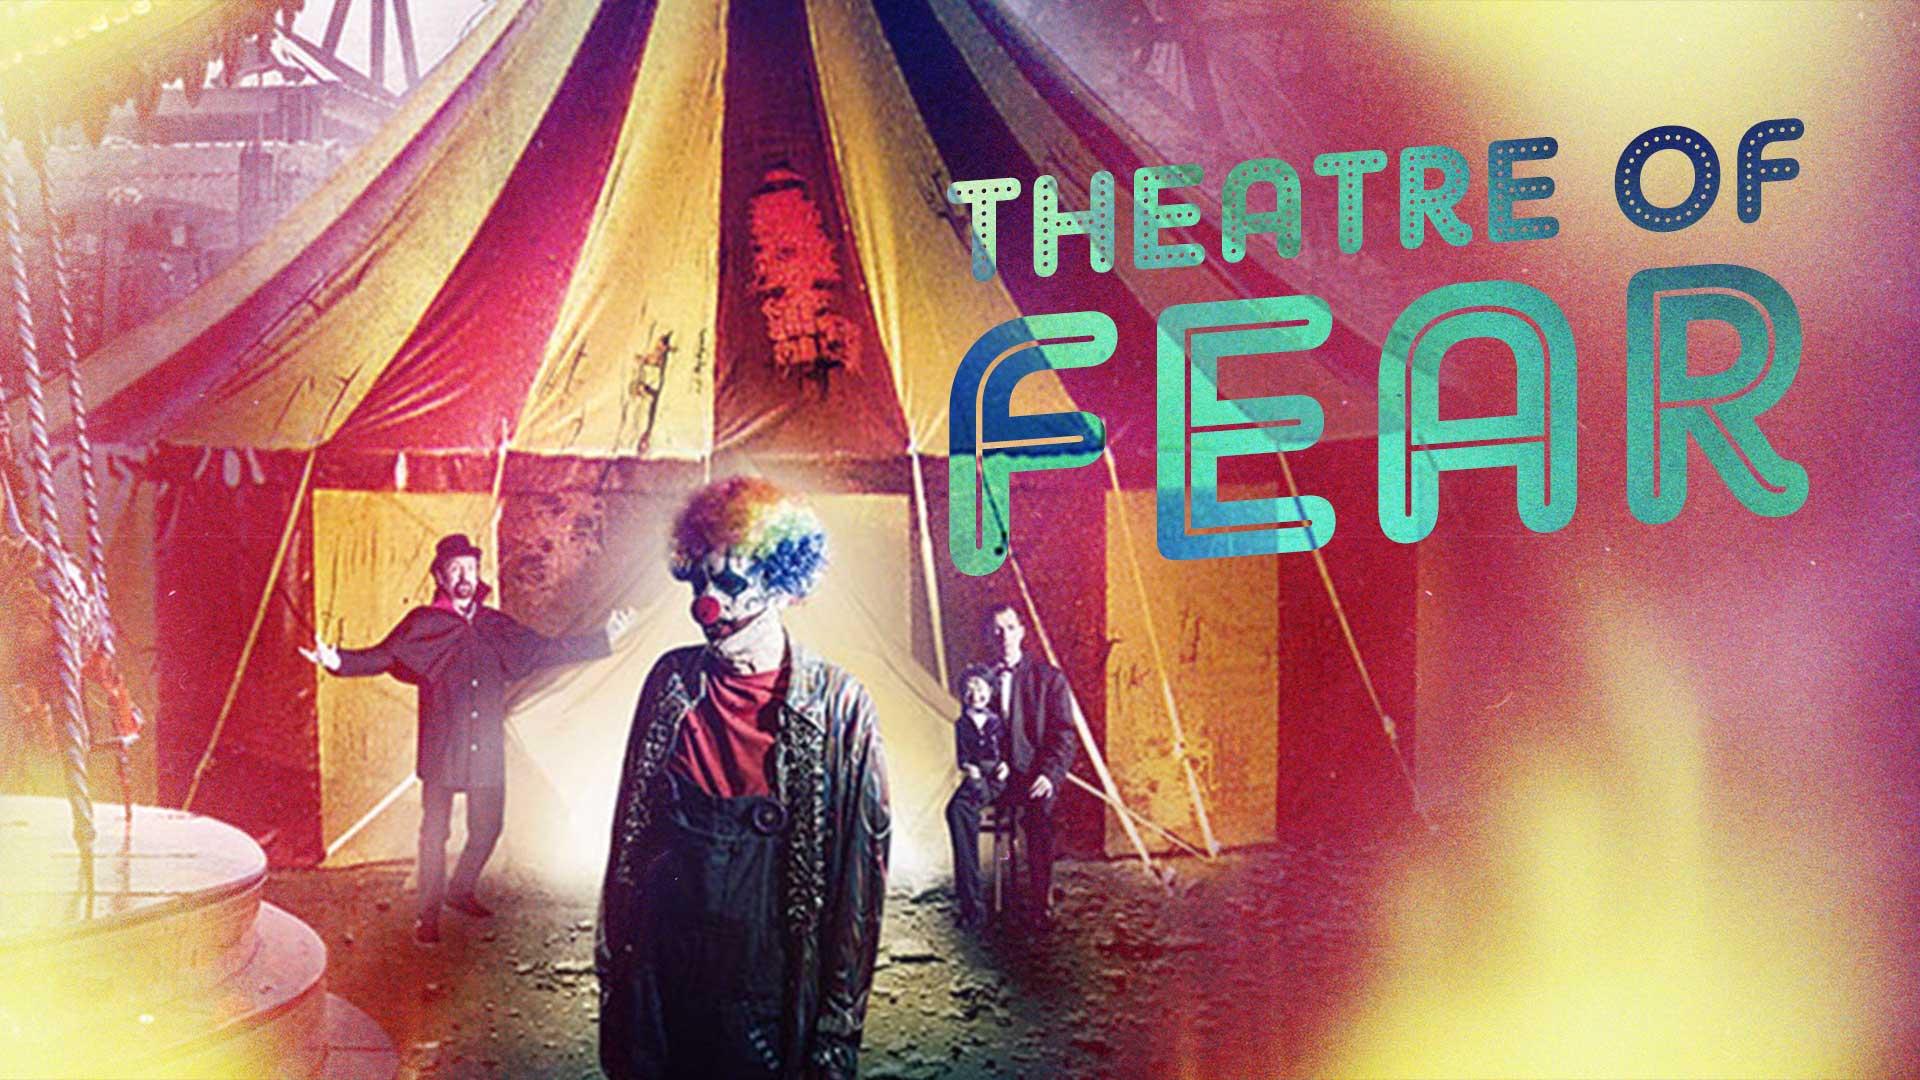 theatre-of-fear\header.jpg